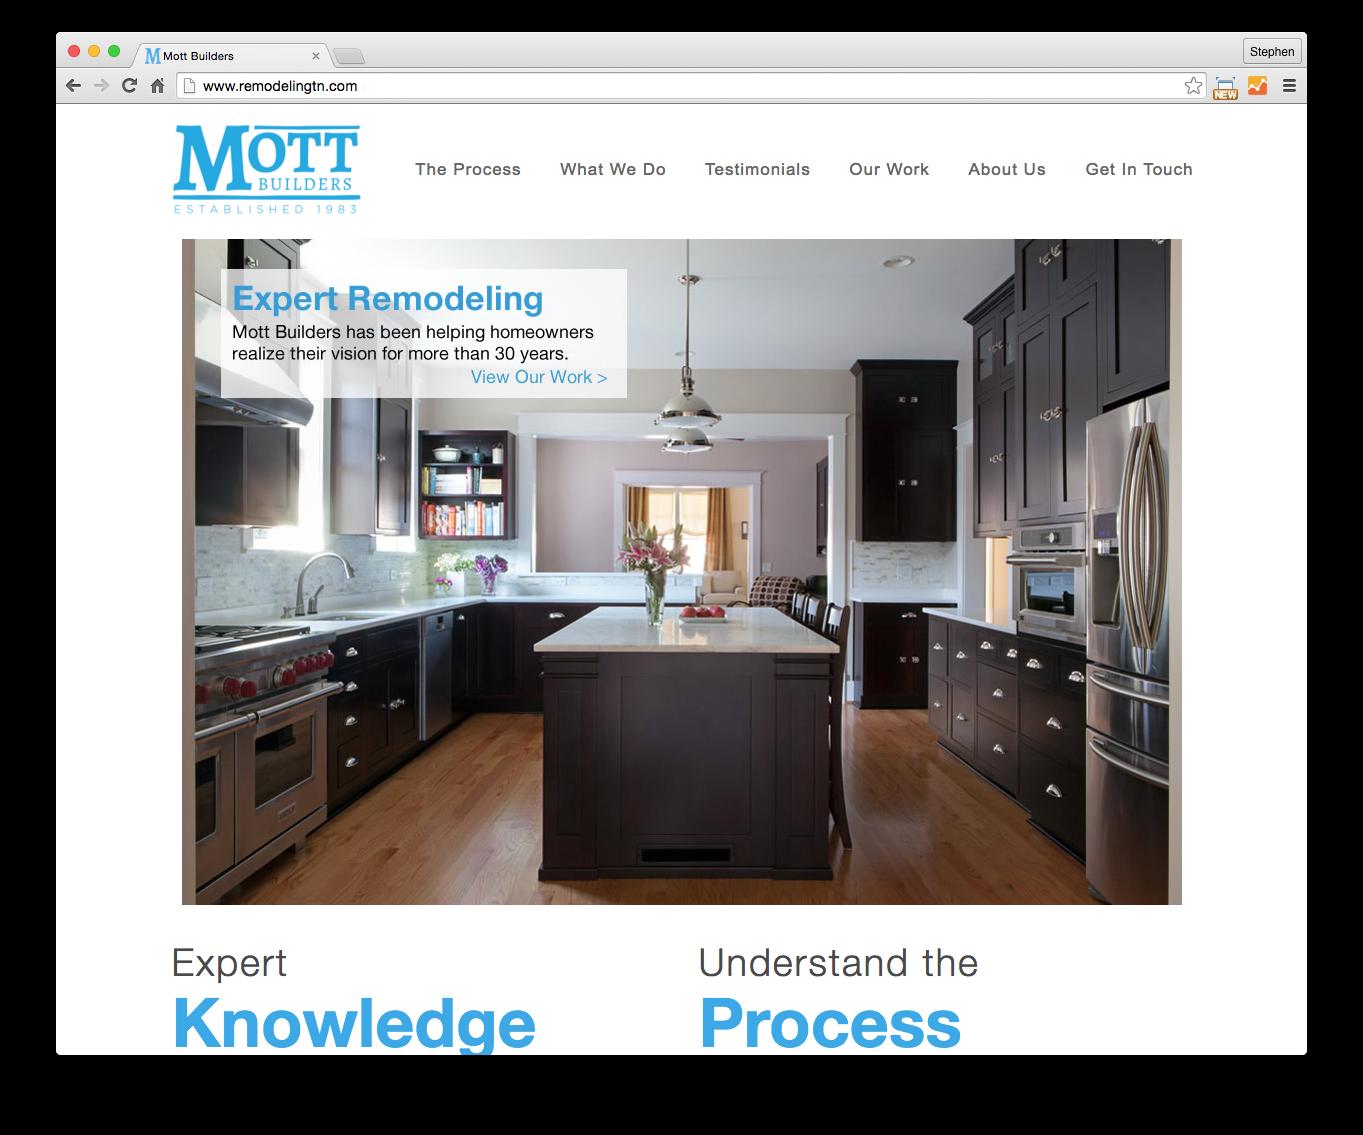 Mott Builders